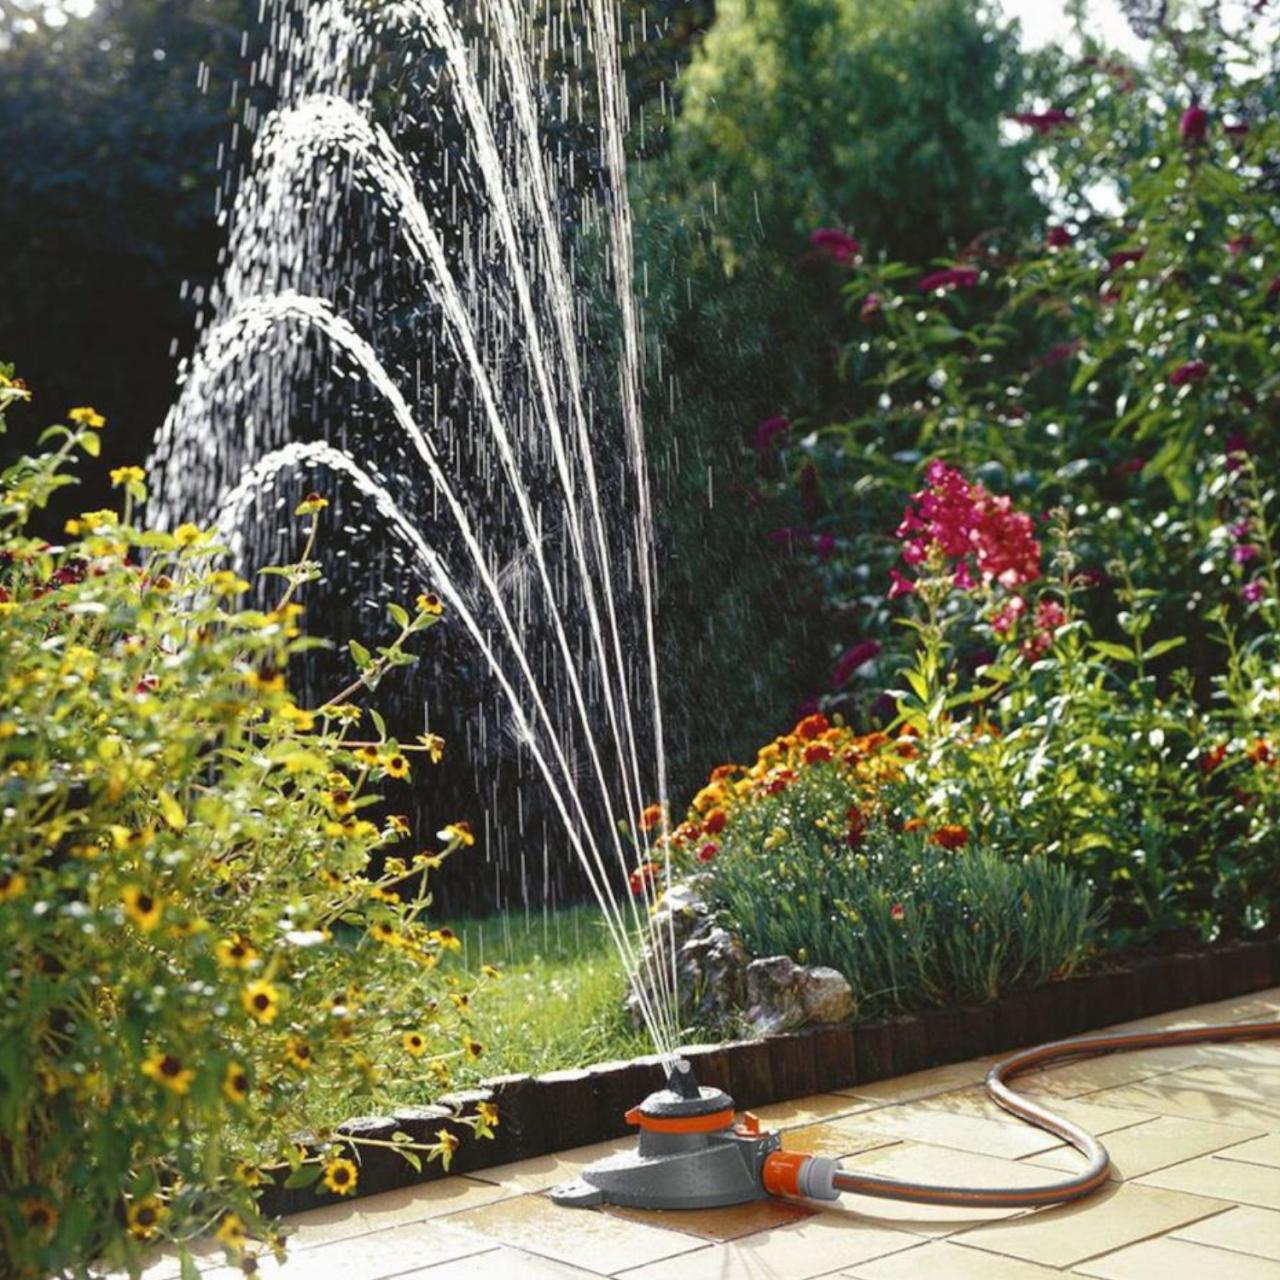 Gardena 2065-20 Comfort Teil- / Vollkreisregner Tango 310 m² Circular Sprinkler